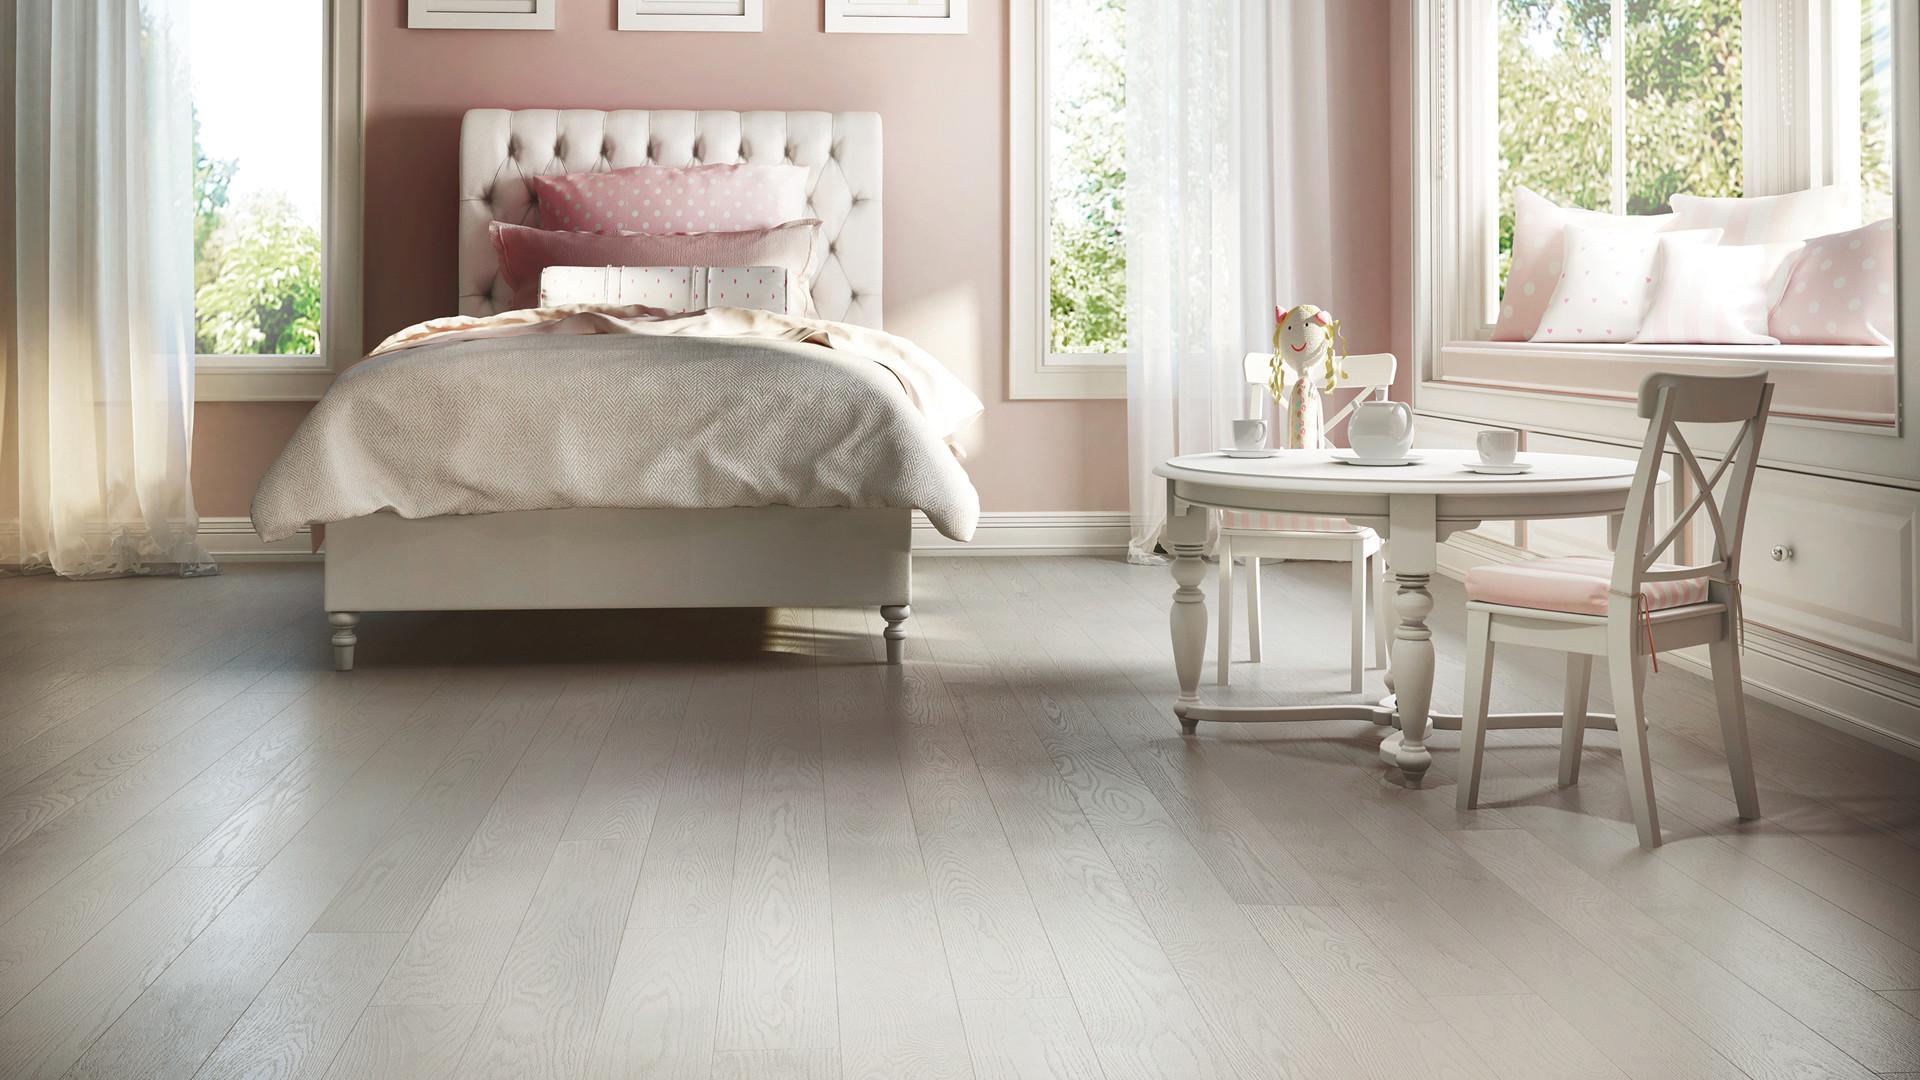 houzz hardwood flooring ideas of 4 latest hardwood flooring trends of 2018 lauzon flooring for new colors in the urban loft series